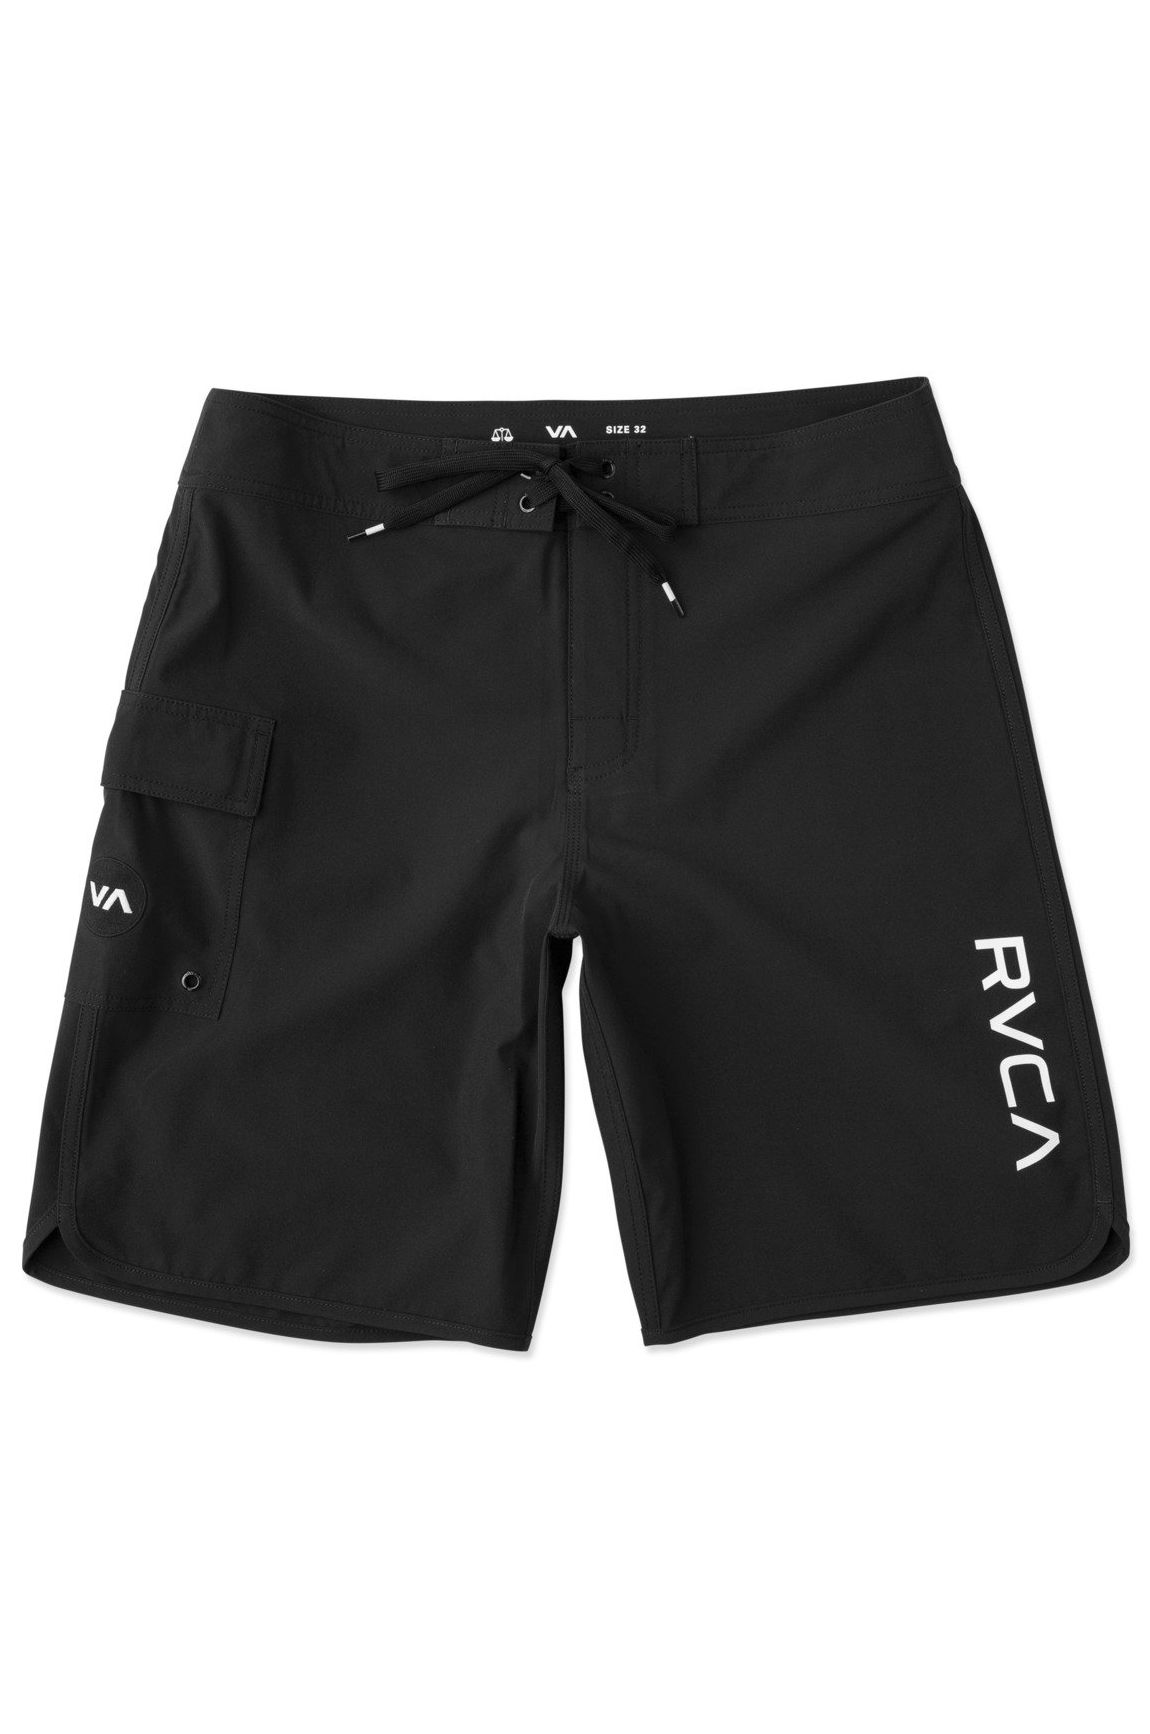 Boardshorts RVCA EASTERN TRUNK 18 All Black